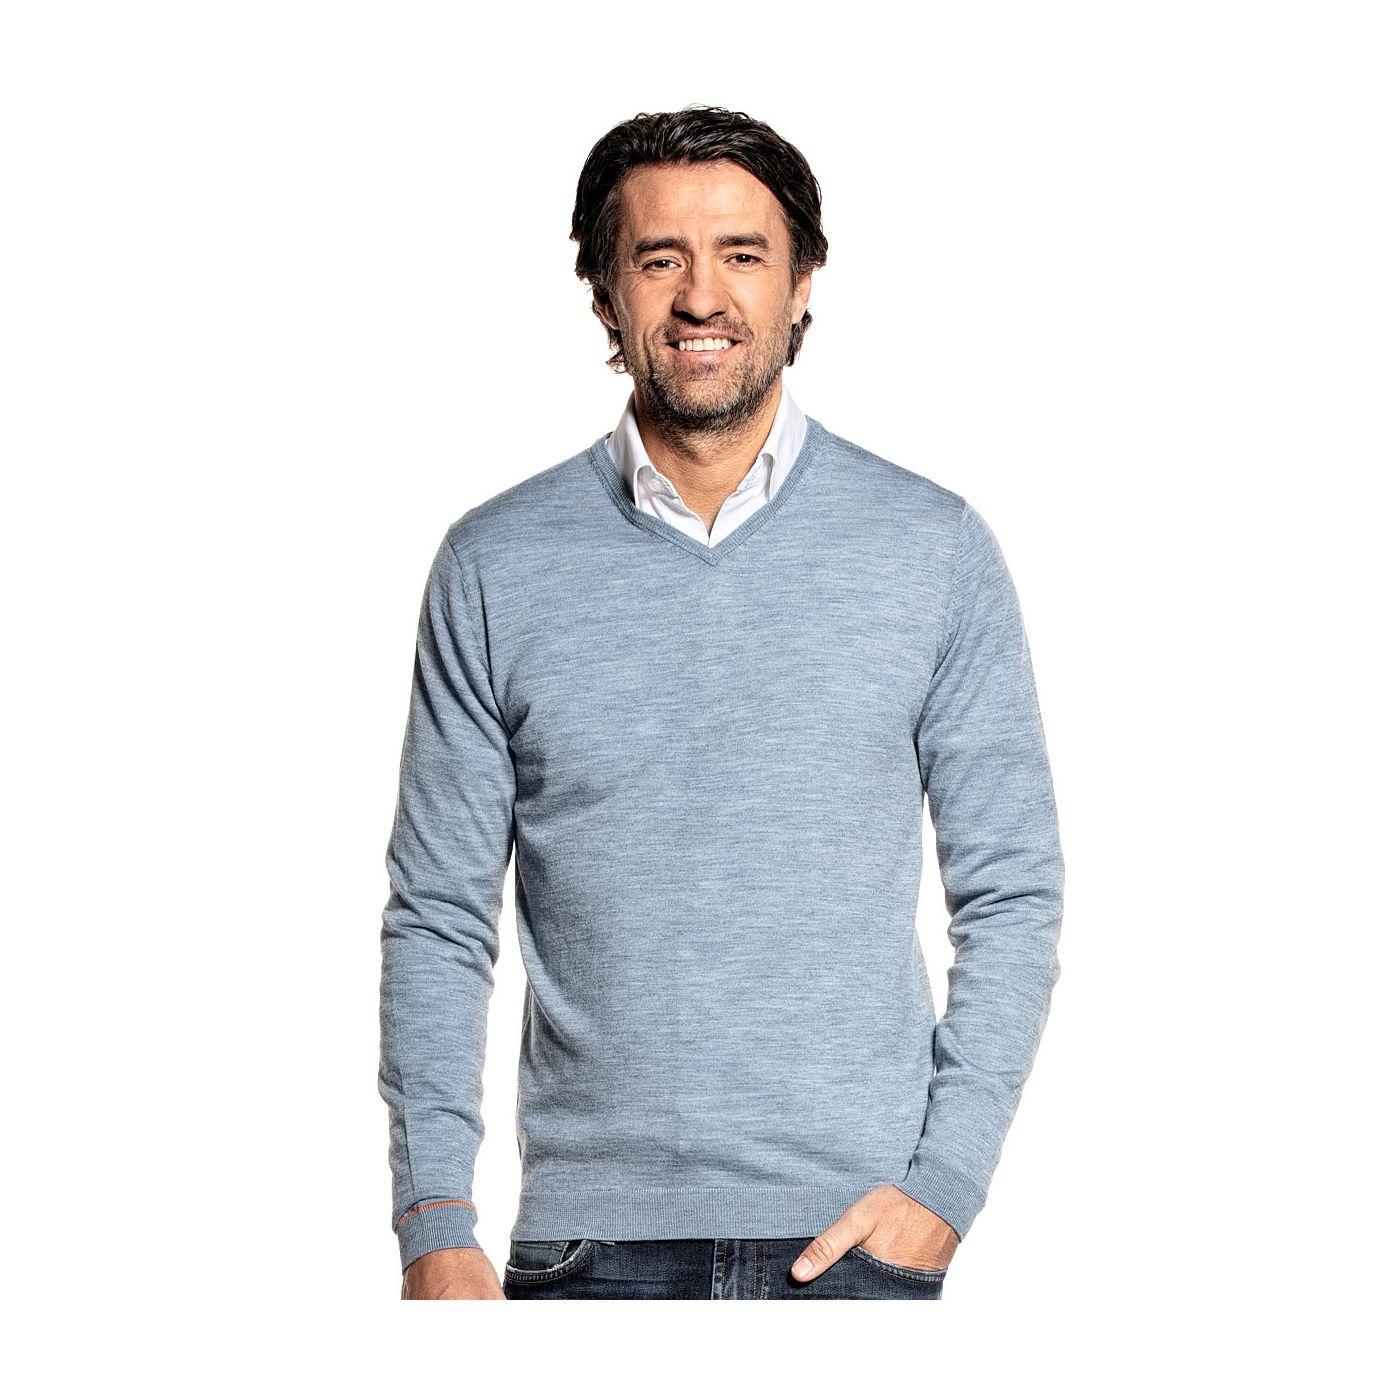 V-Neck sweater for men made of Merino wool in Blue grey